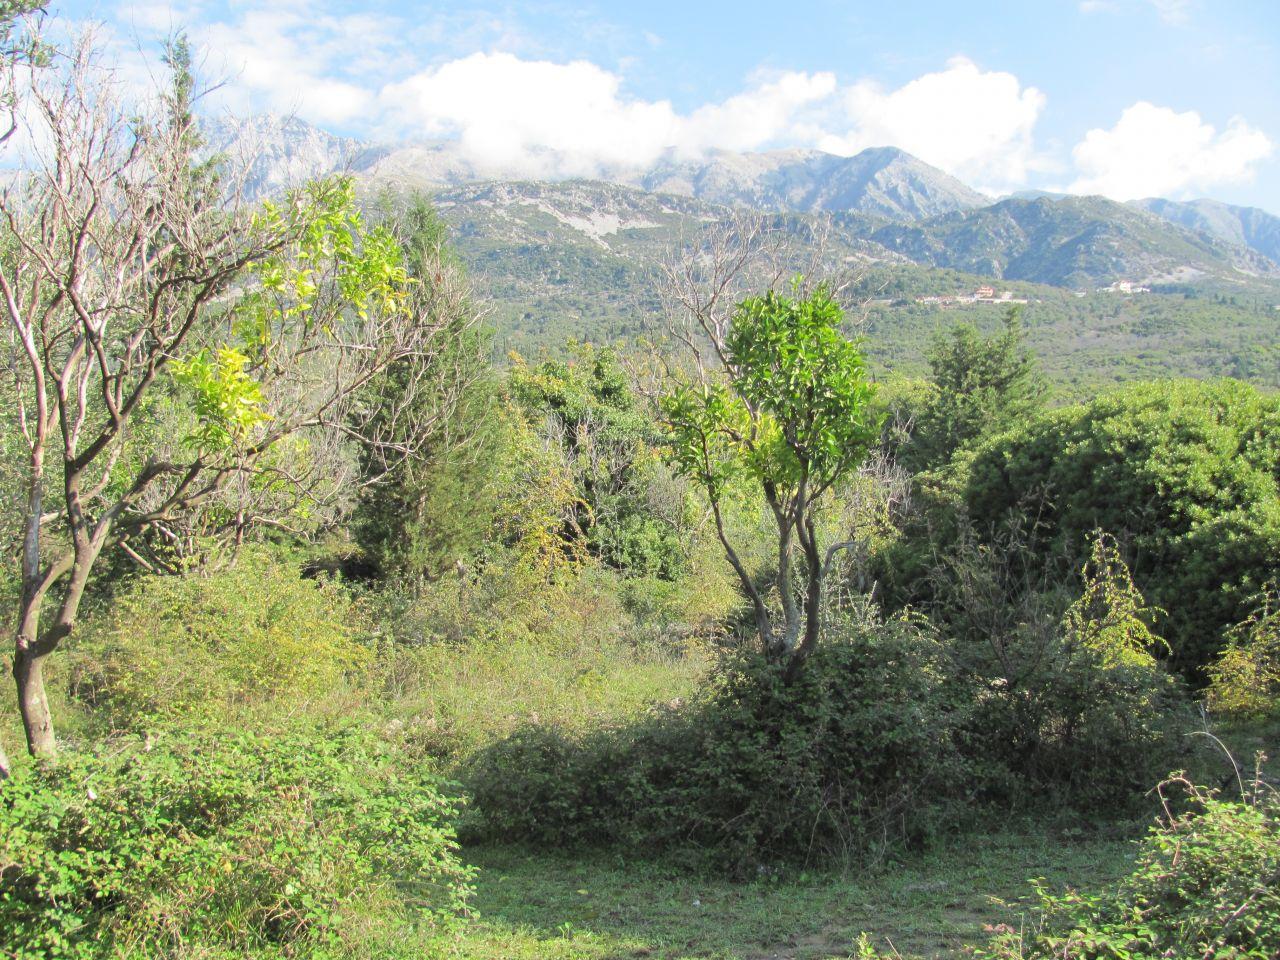 Land for sale in Dhermi, a beautiful coastal village in Albania.